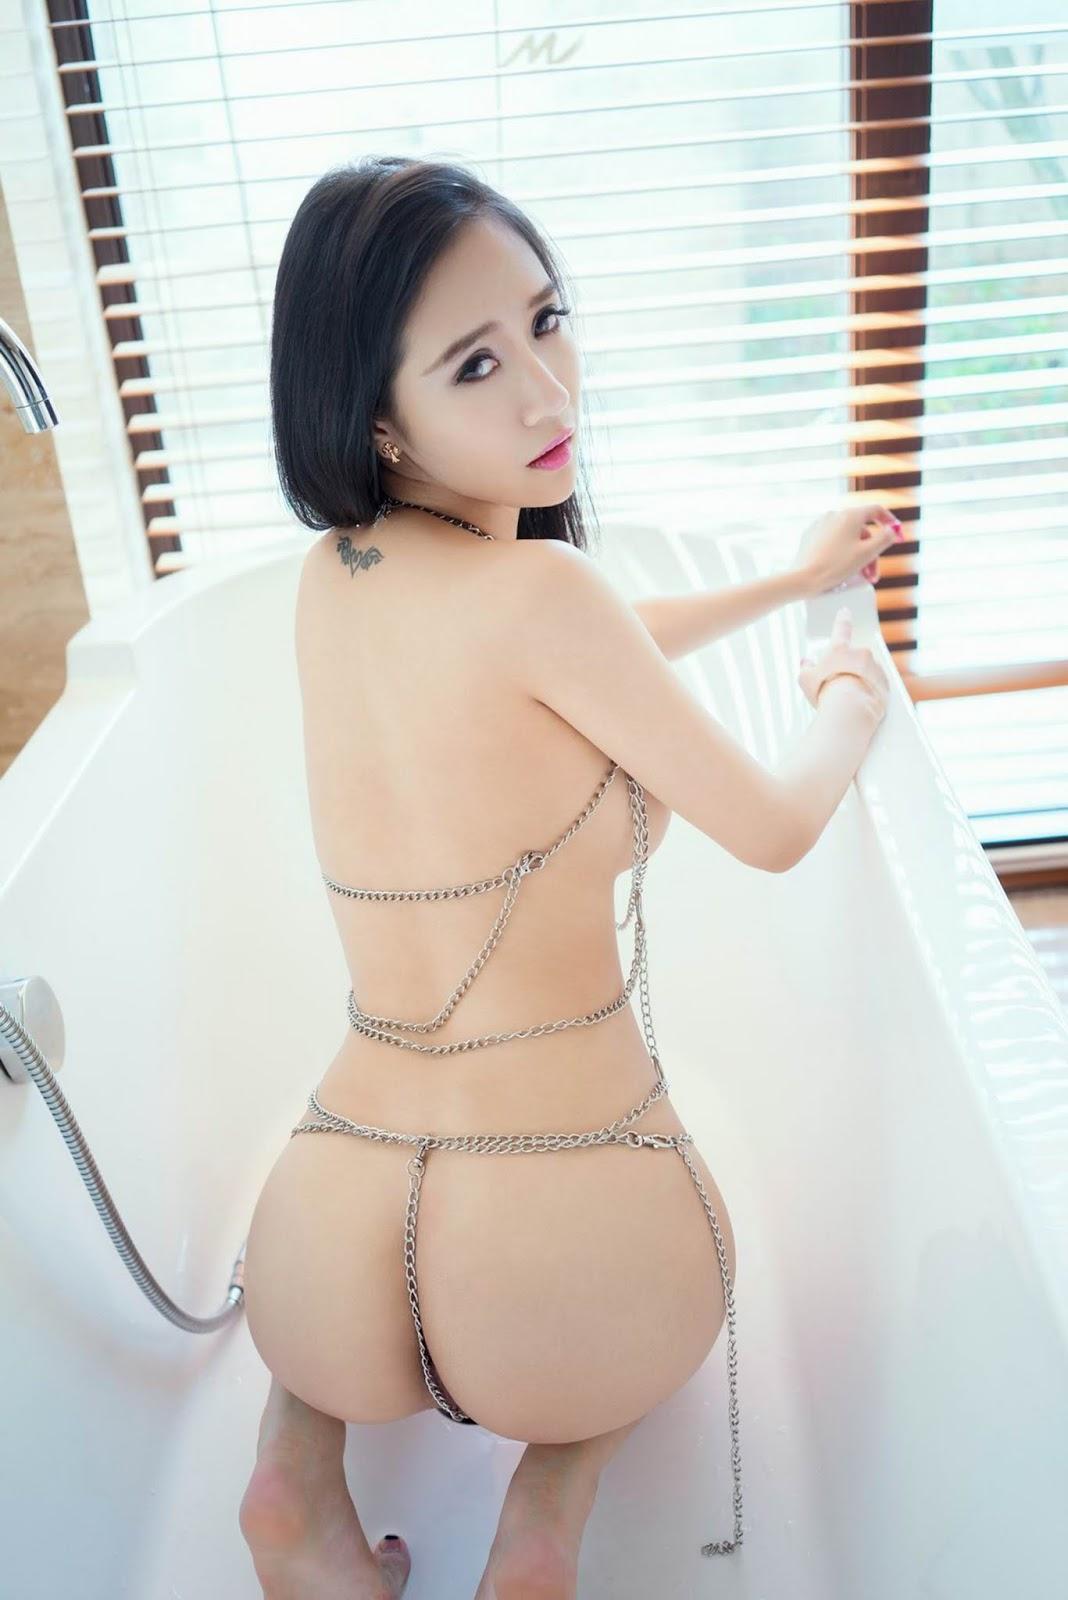 %25E4%25BA%258E%25E5%25A4%25A7%25E5%25B0%258F%25E5%25A7%2590%2B%252830%2529 - Sexy Hot TUIGIRL NO.24 Nude Fuck